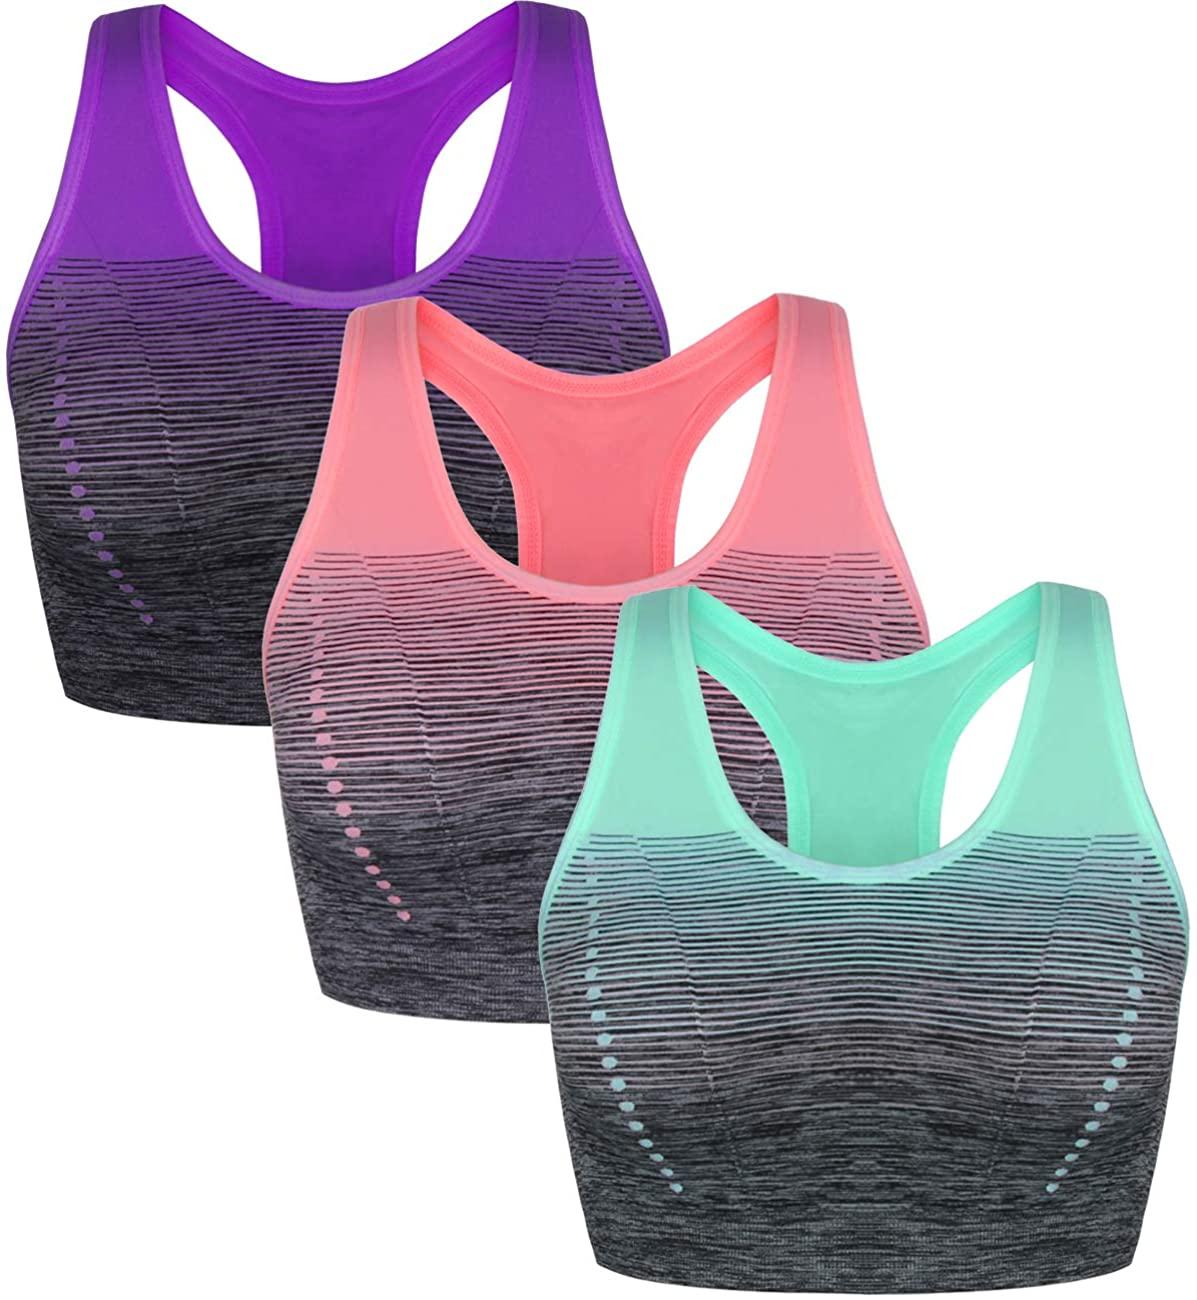 Sykooria 1-3 Pack Women's Sports Bra Racerback Tank Workout Tops Medium Impact Zip Front Active Fitness Yoga Bras